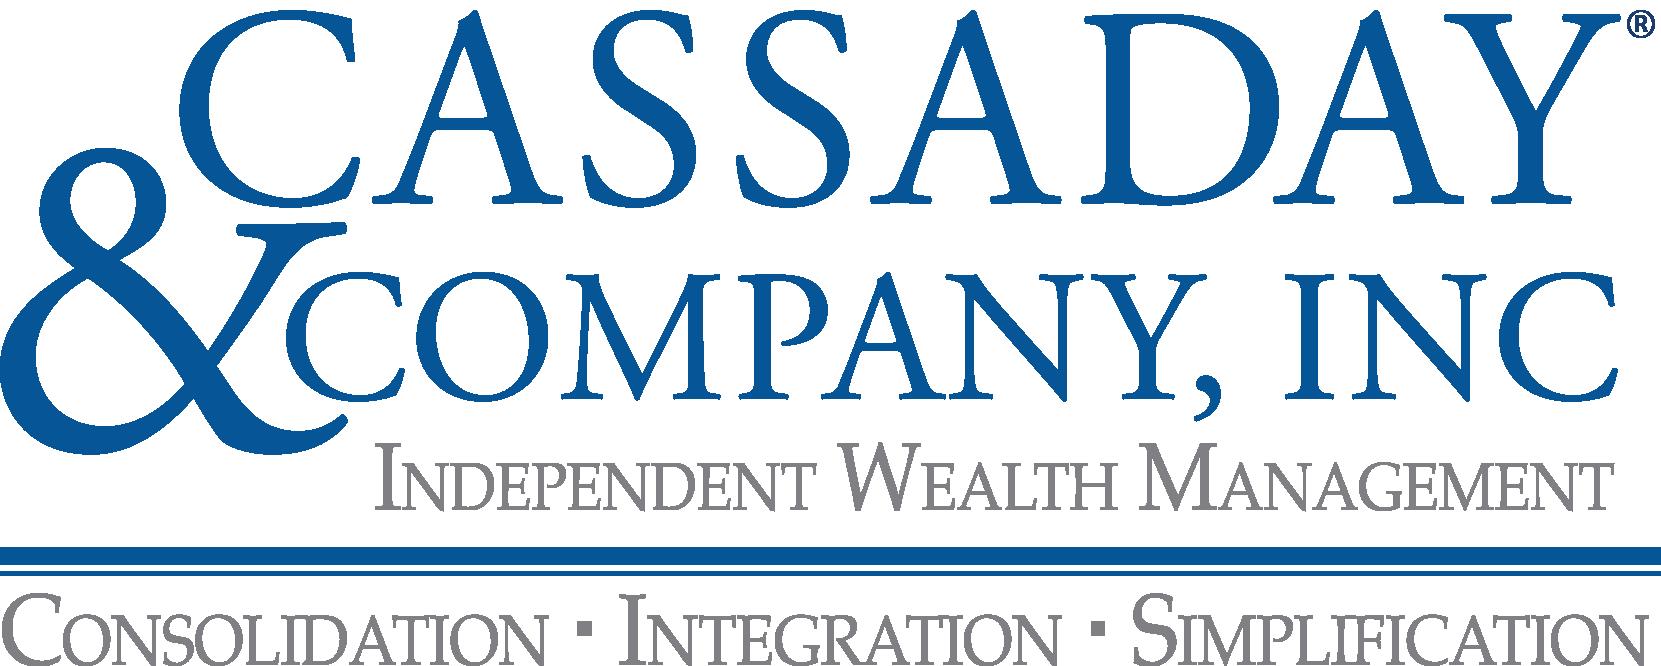 Cassaday & Company, Inc. logo